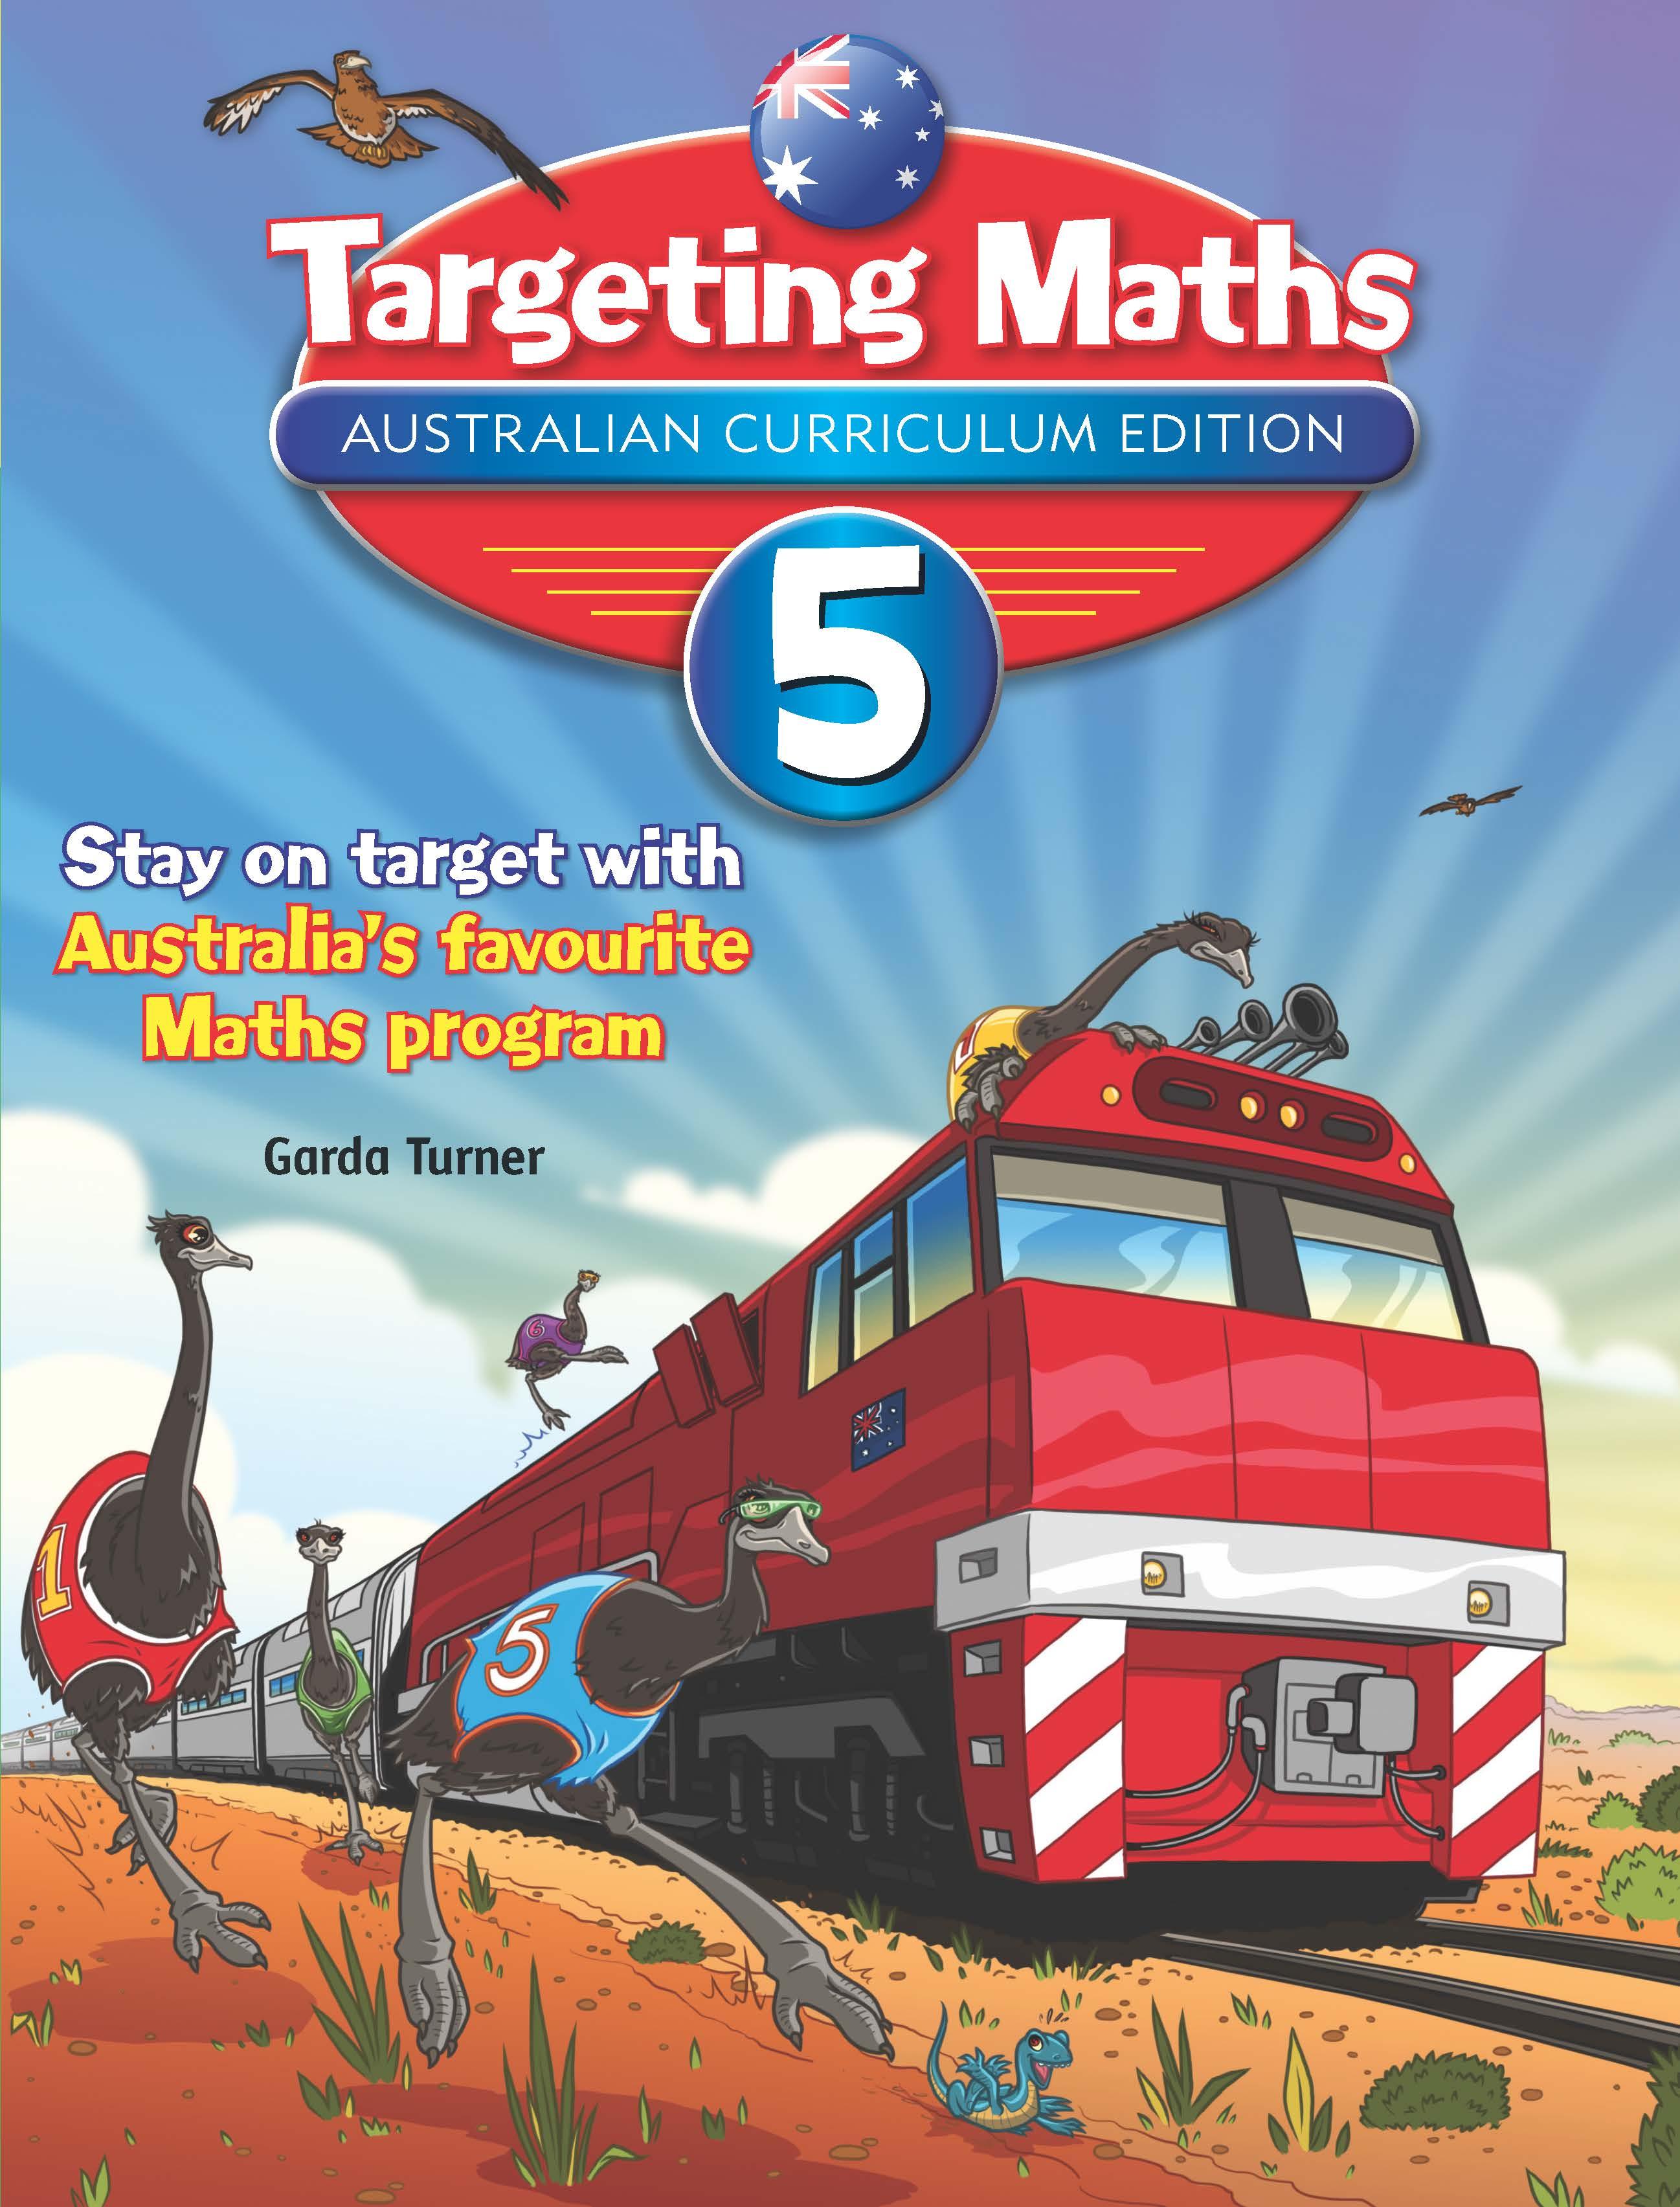 Targeting Maths Australian Curriculum Edition Student Book Year 5